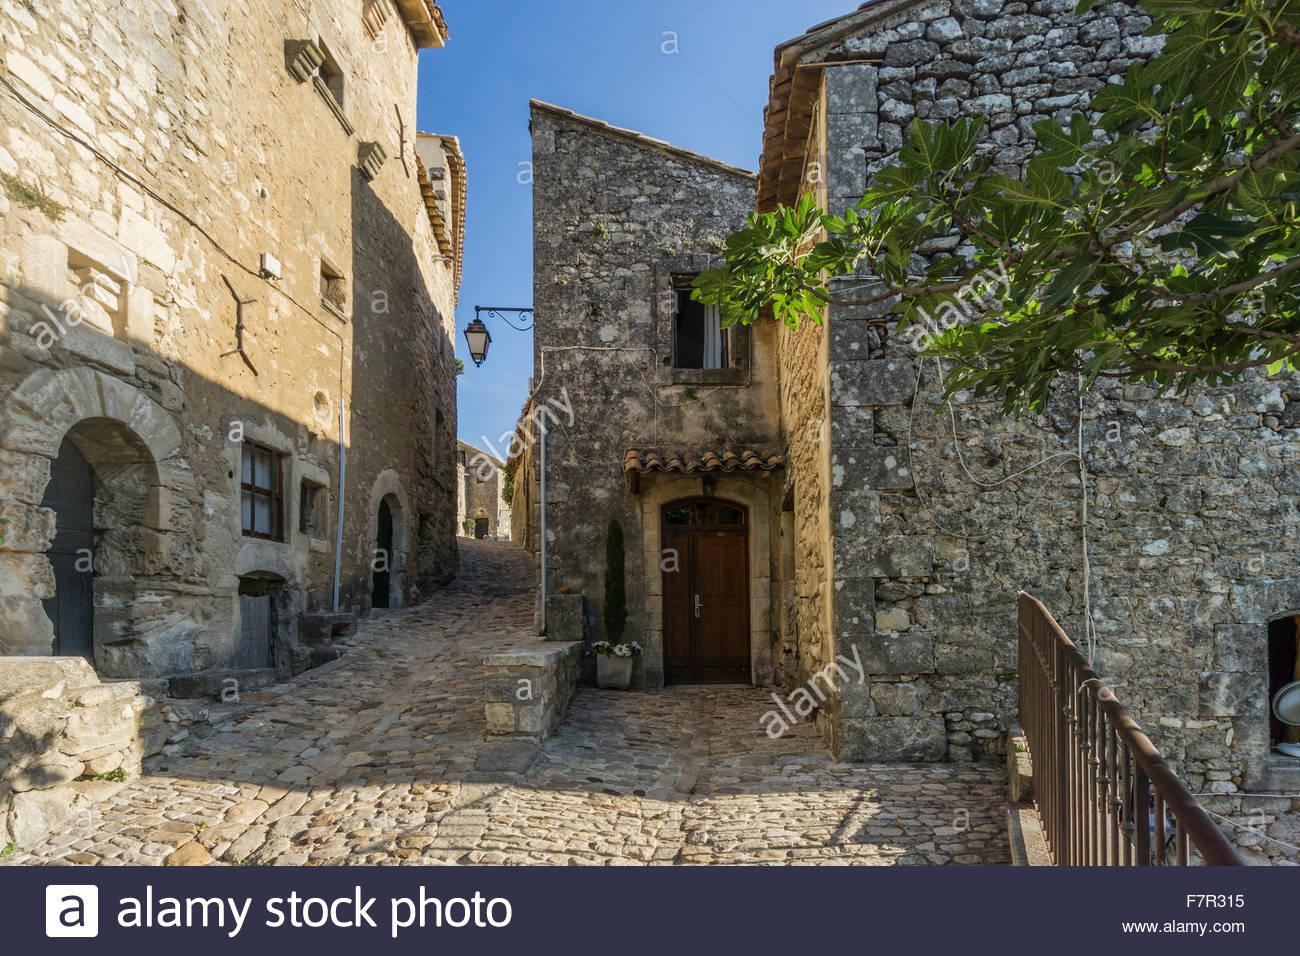 village-street-in-lacoste-provence-france-F7R315.jpg